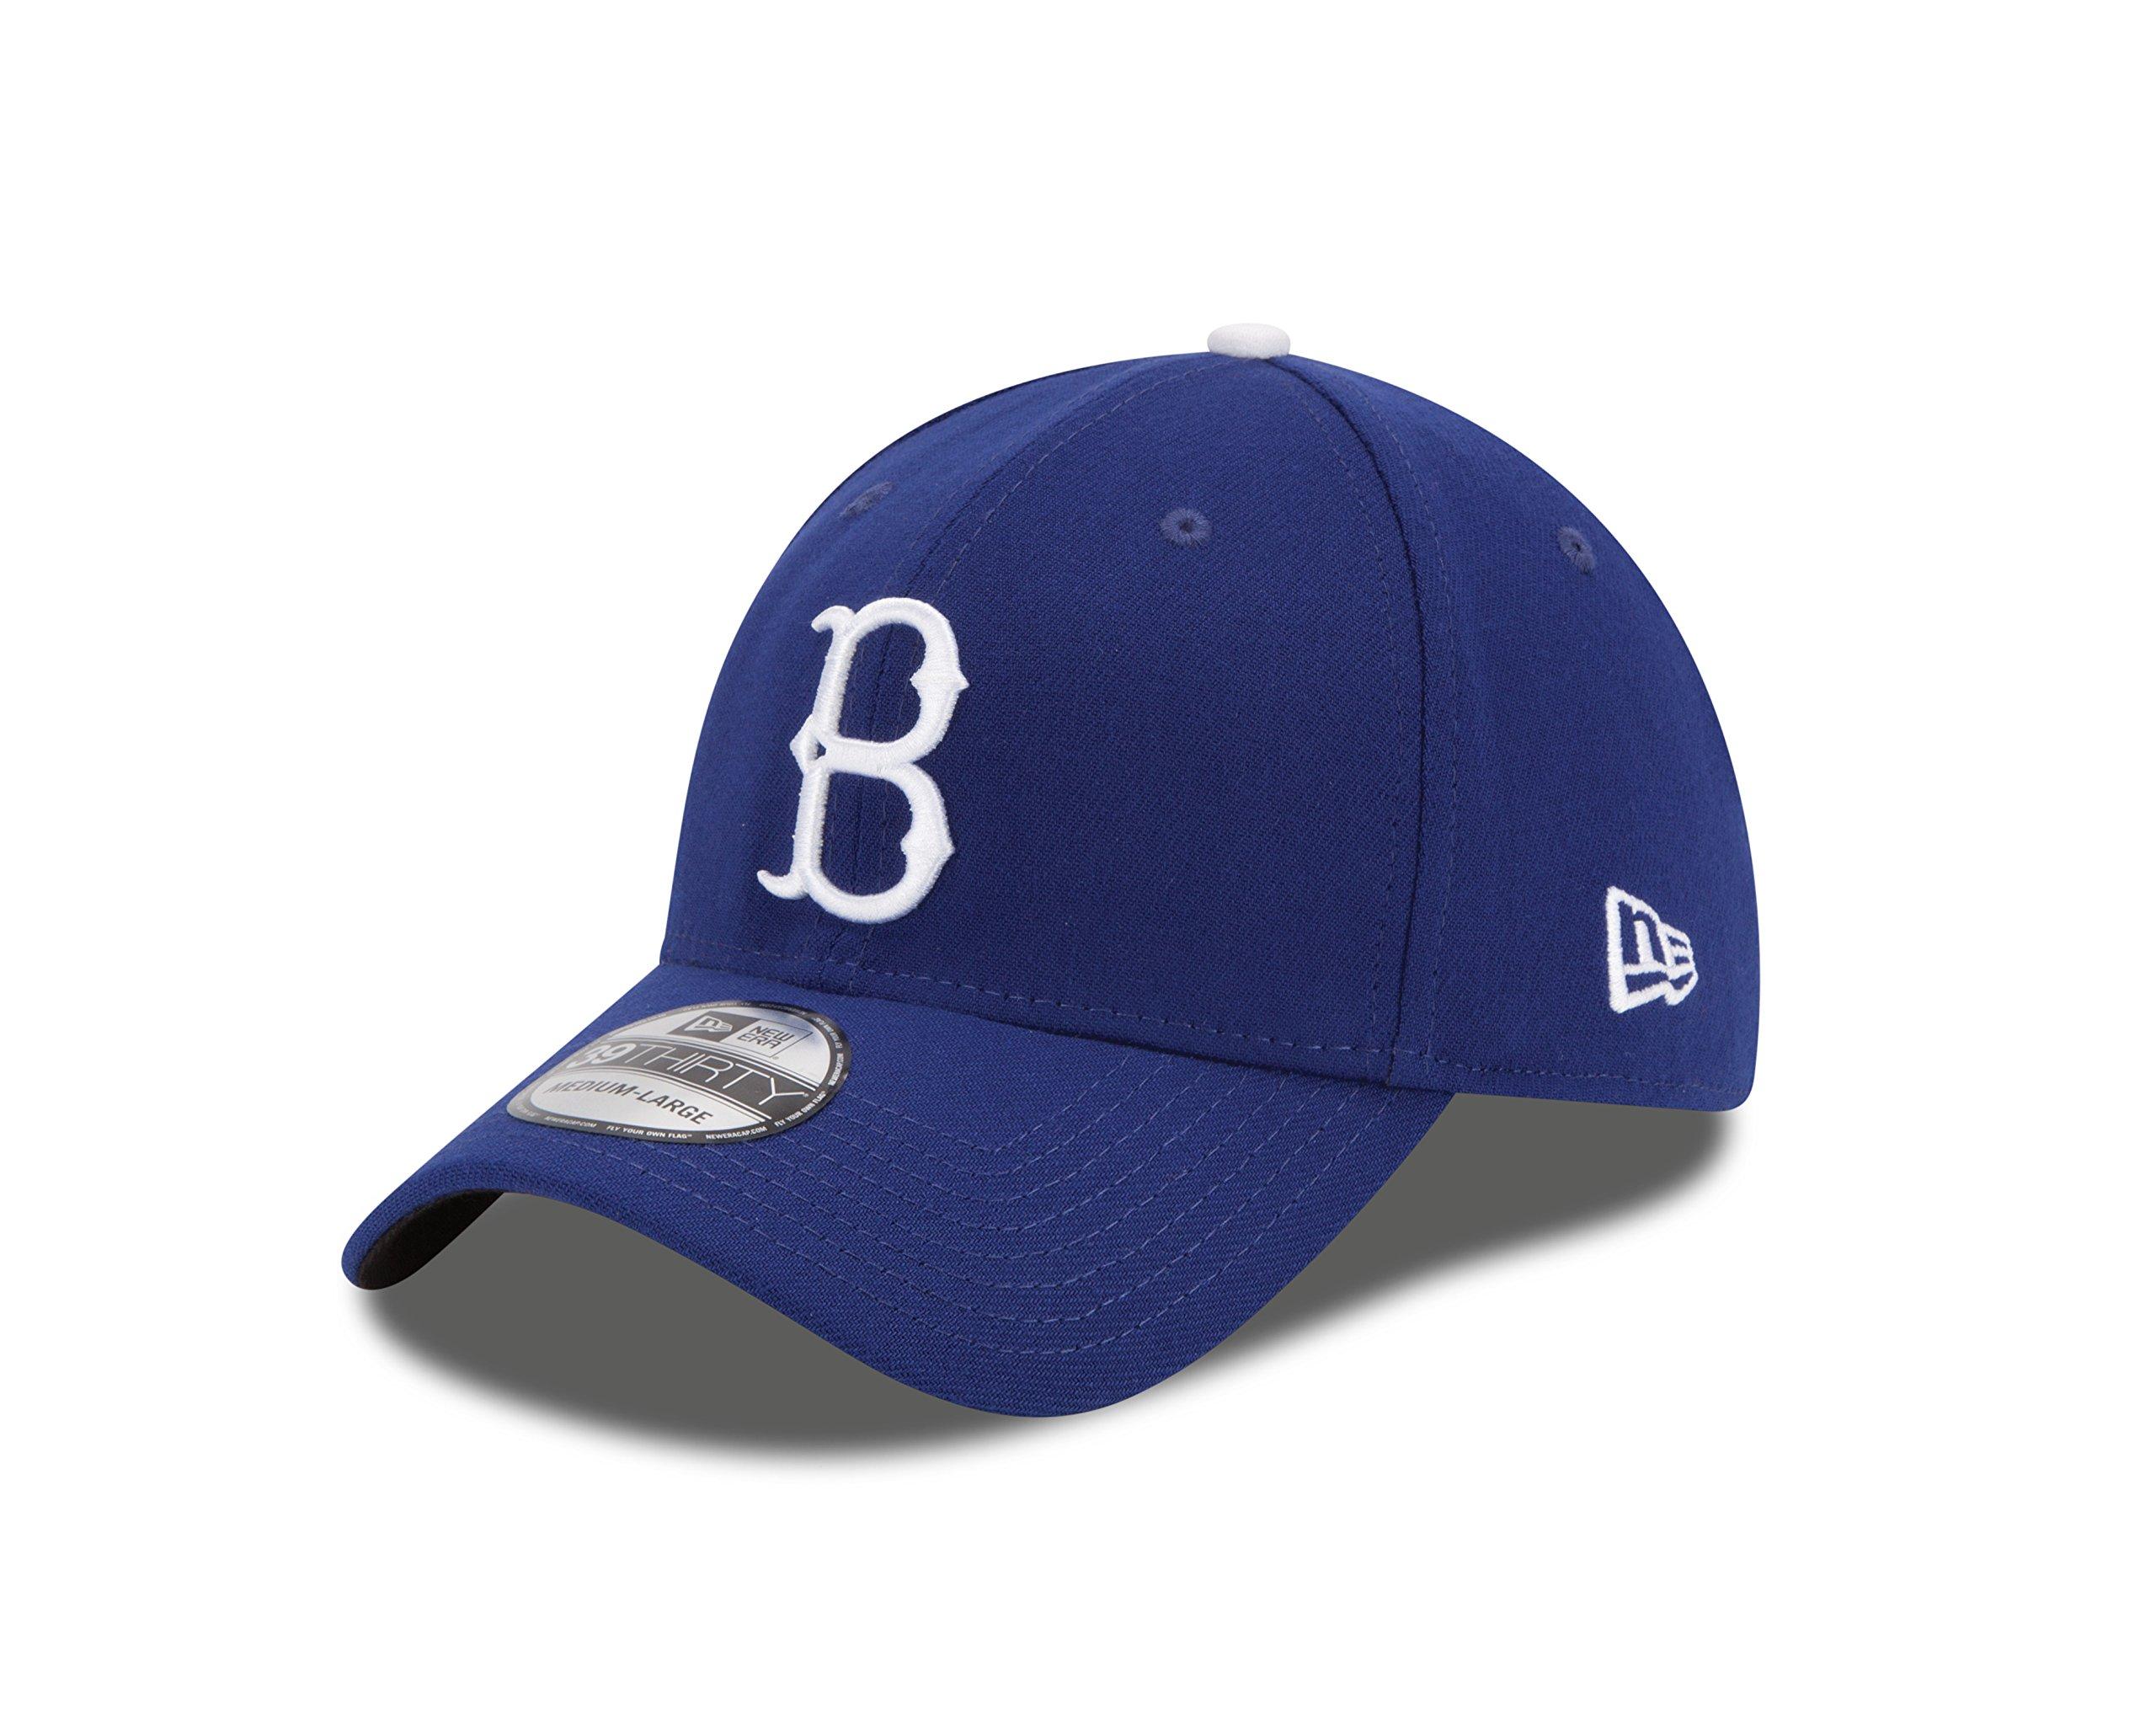 New Era MLB Brooklyn Dodgers Cooperstown Team Classic 39Thirty Stretch Fit Cap, Small/Medium, Royal